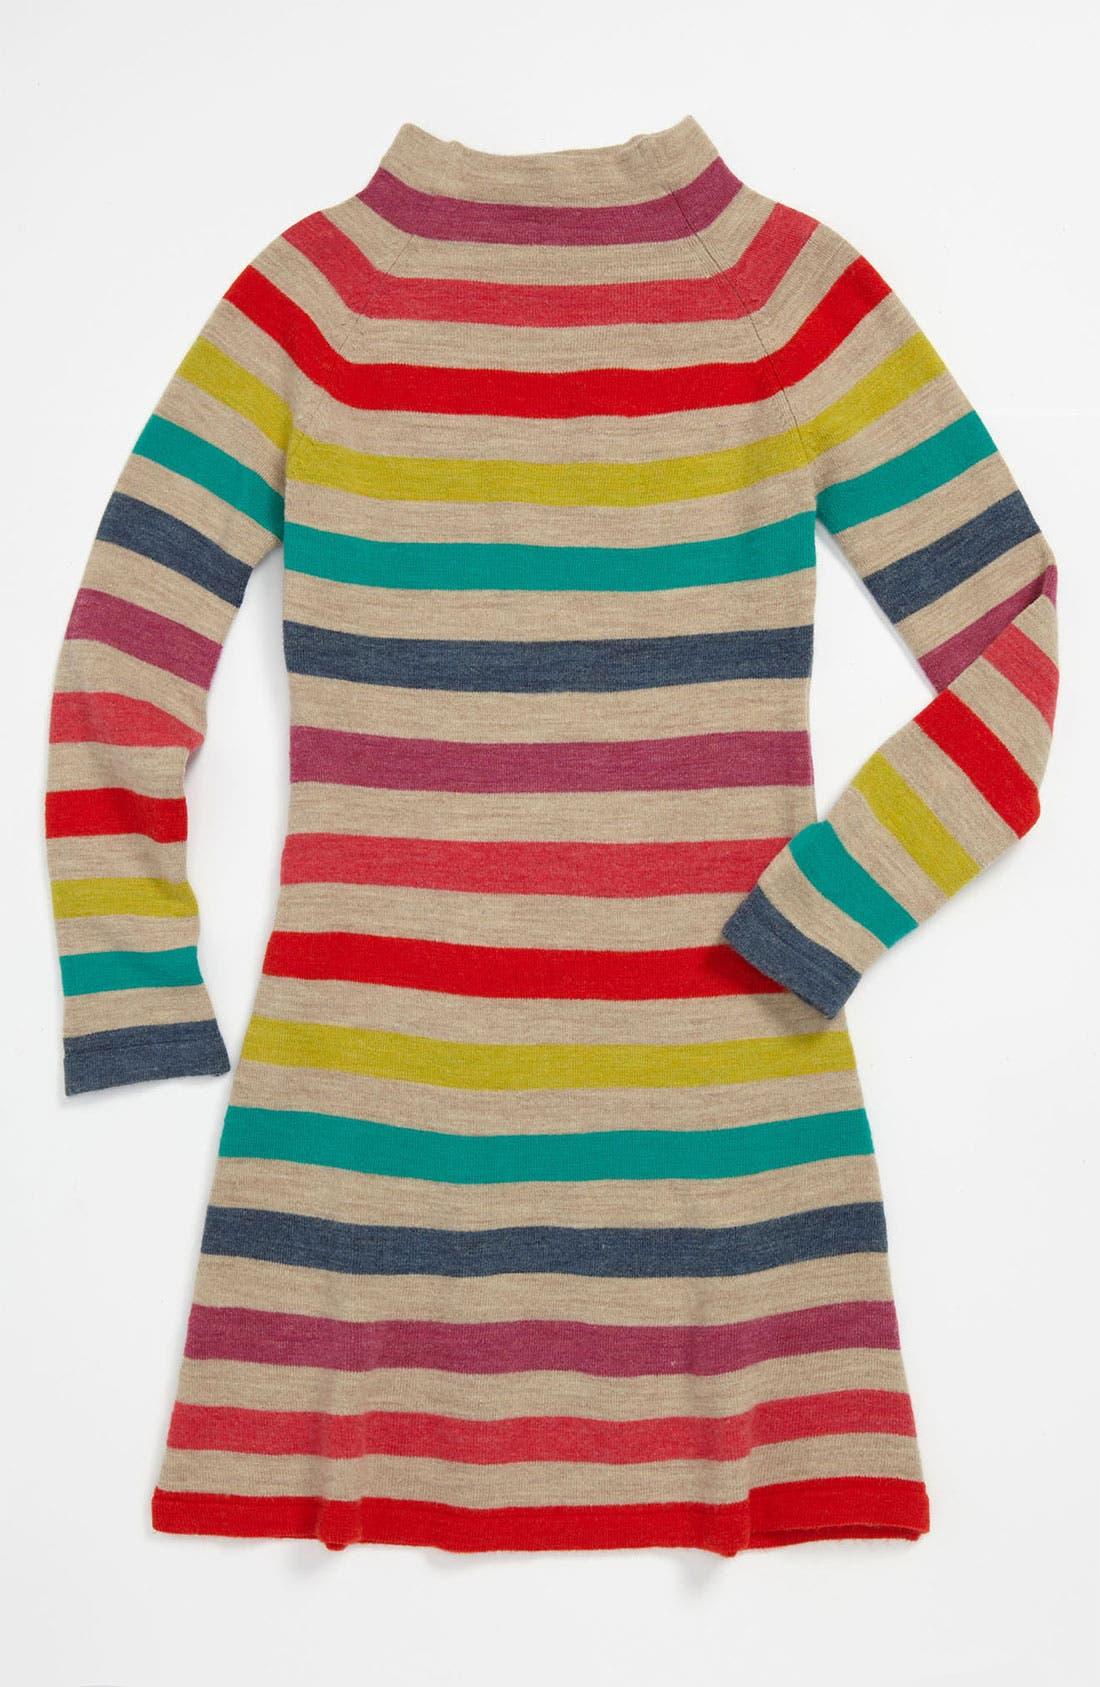 Alternate Image 1 Selected - United Colors of Benetton Kids Stripe Sweater Dress (Little Girls & Big Girls)